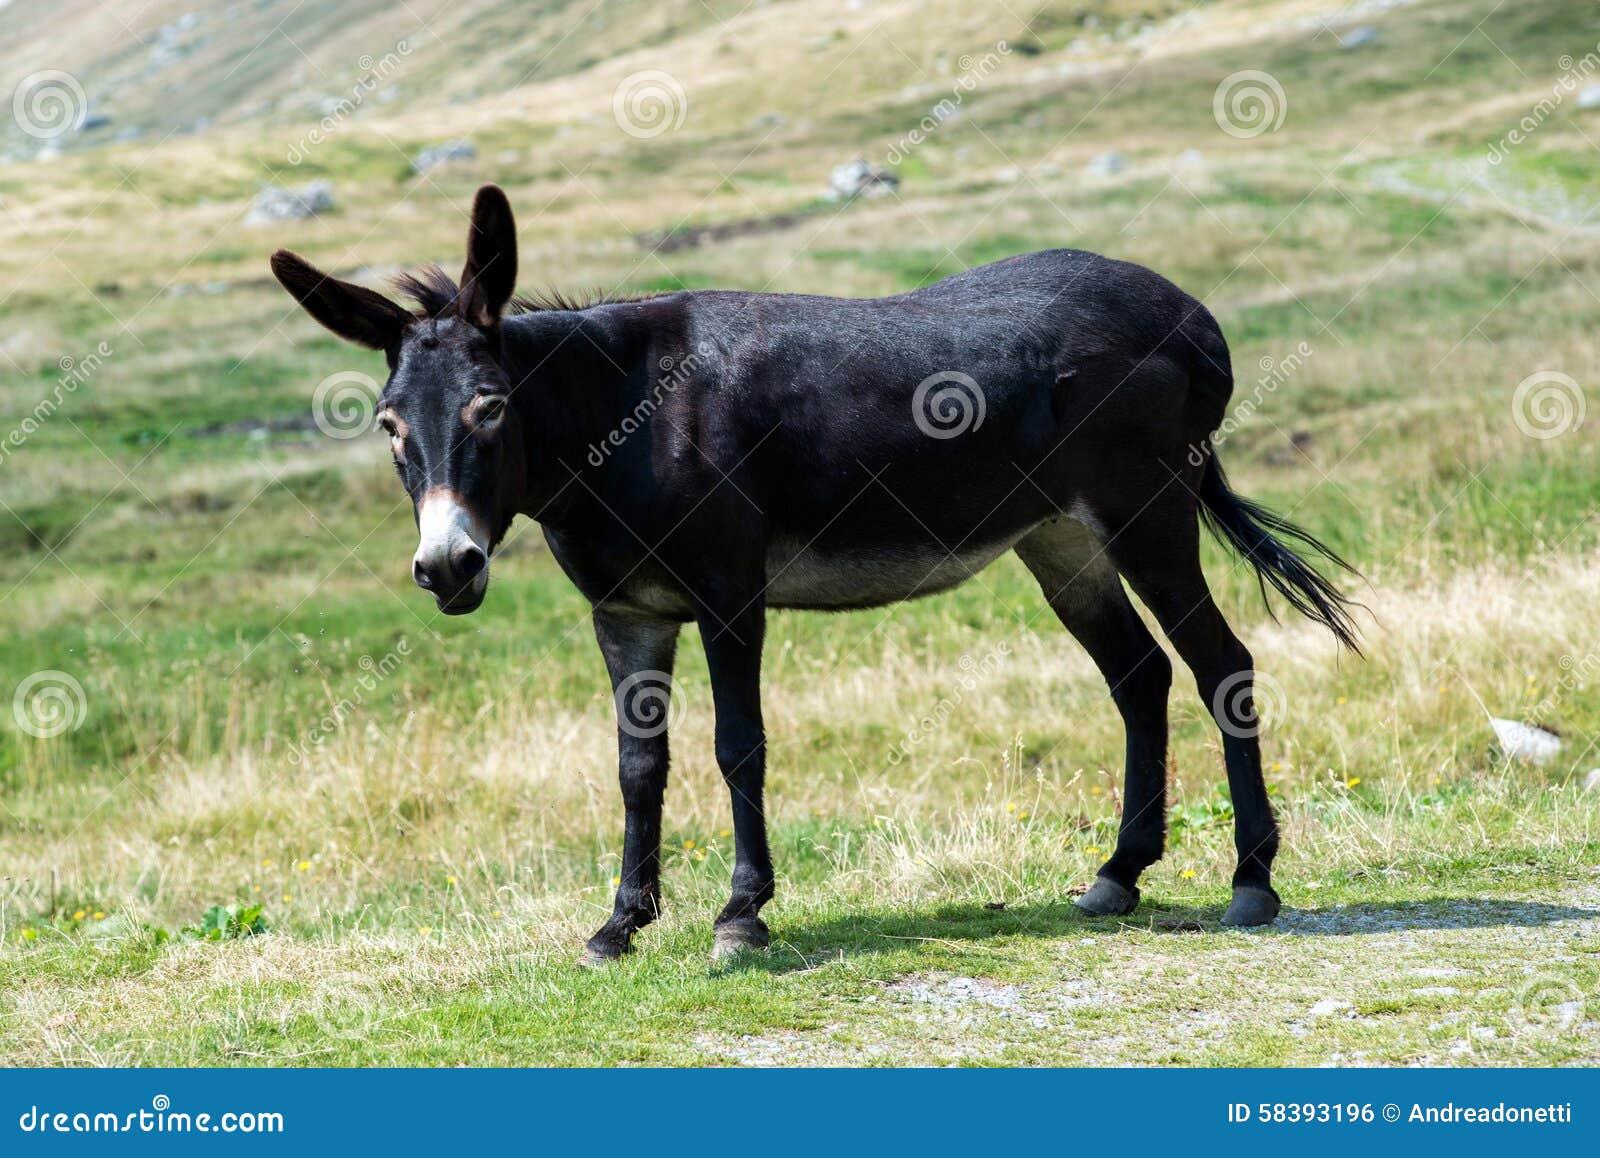 Schwarze Esel Junge Ingwer-Pornos